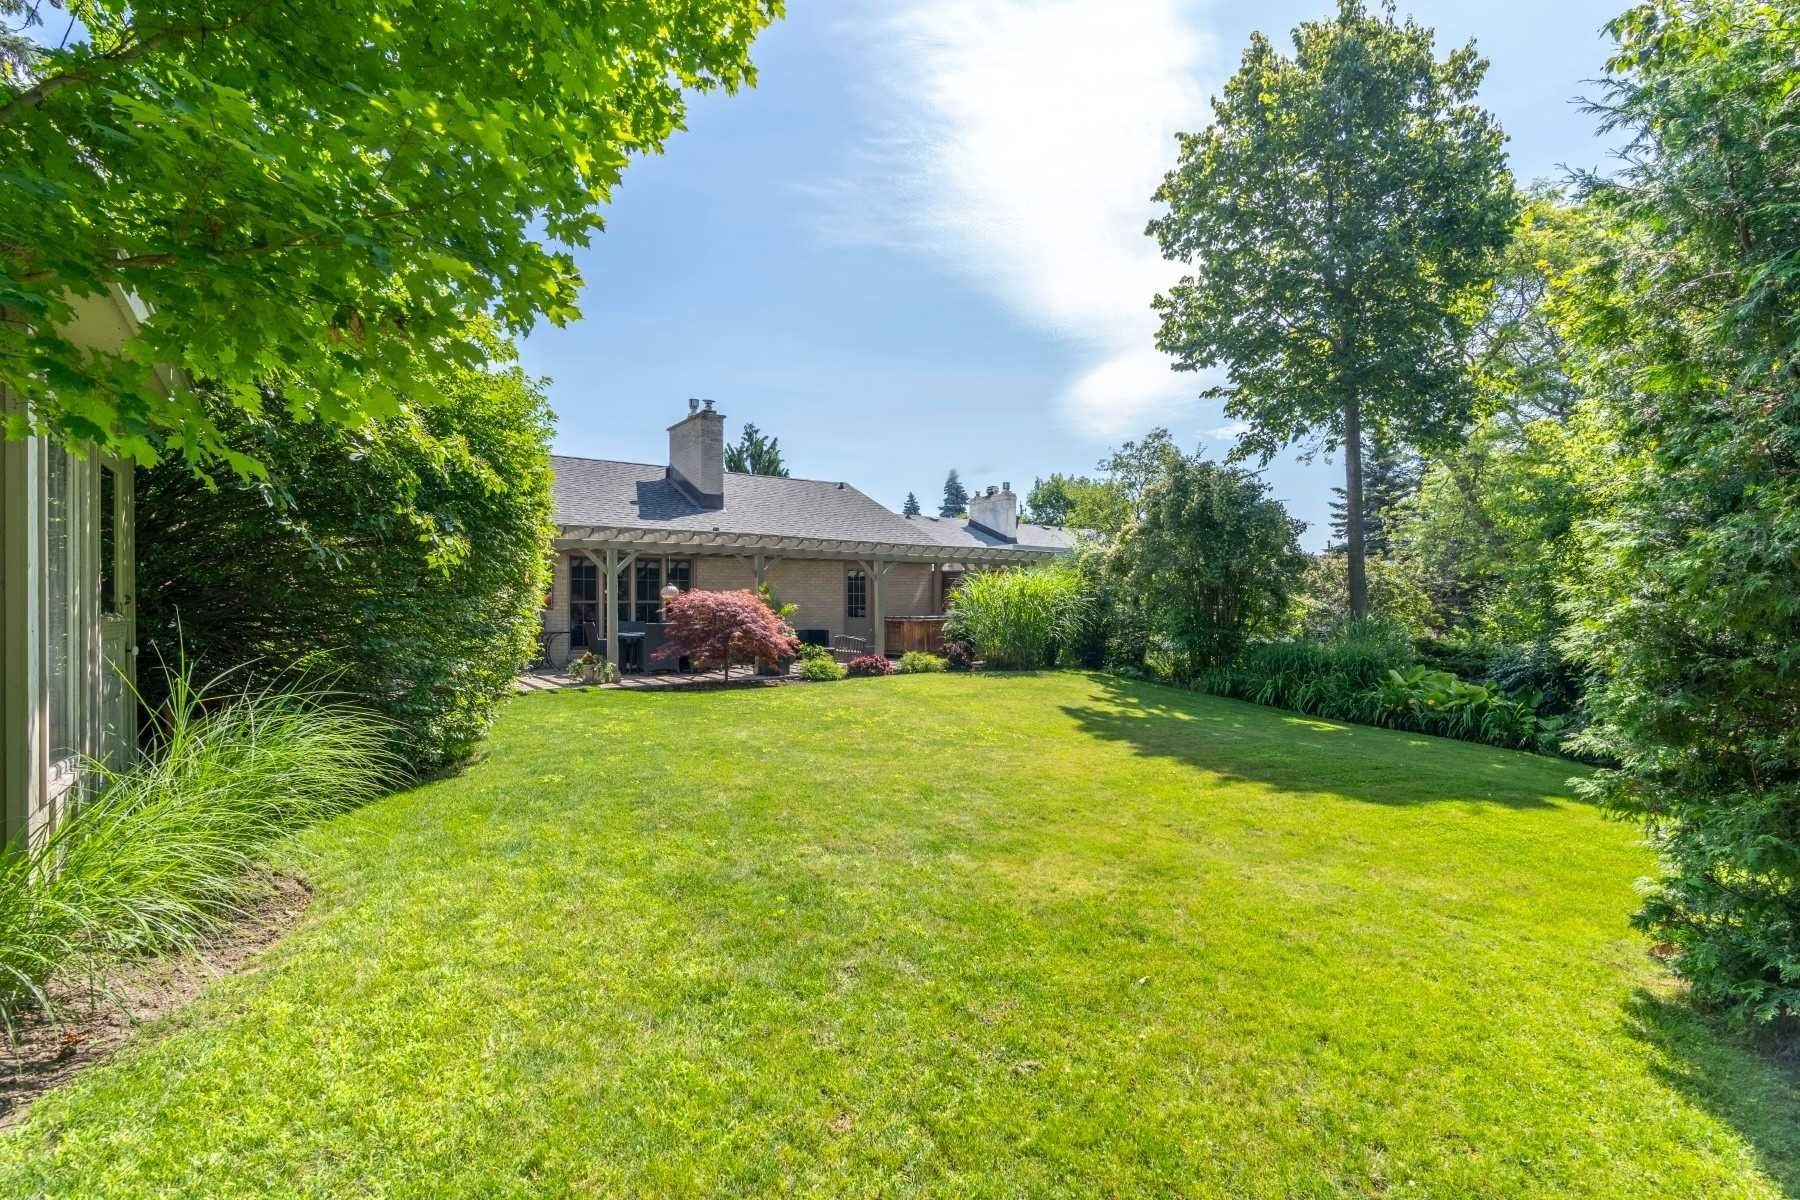 Photo 34: Photos: 782 Bessborough Drive in Oshawa: Centennial House (Bungalow) for sale : MLS®# E4968487